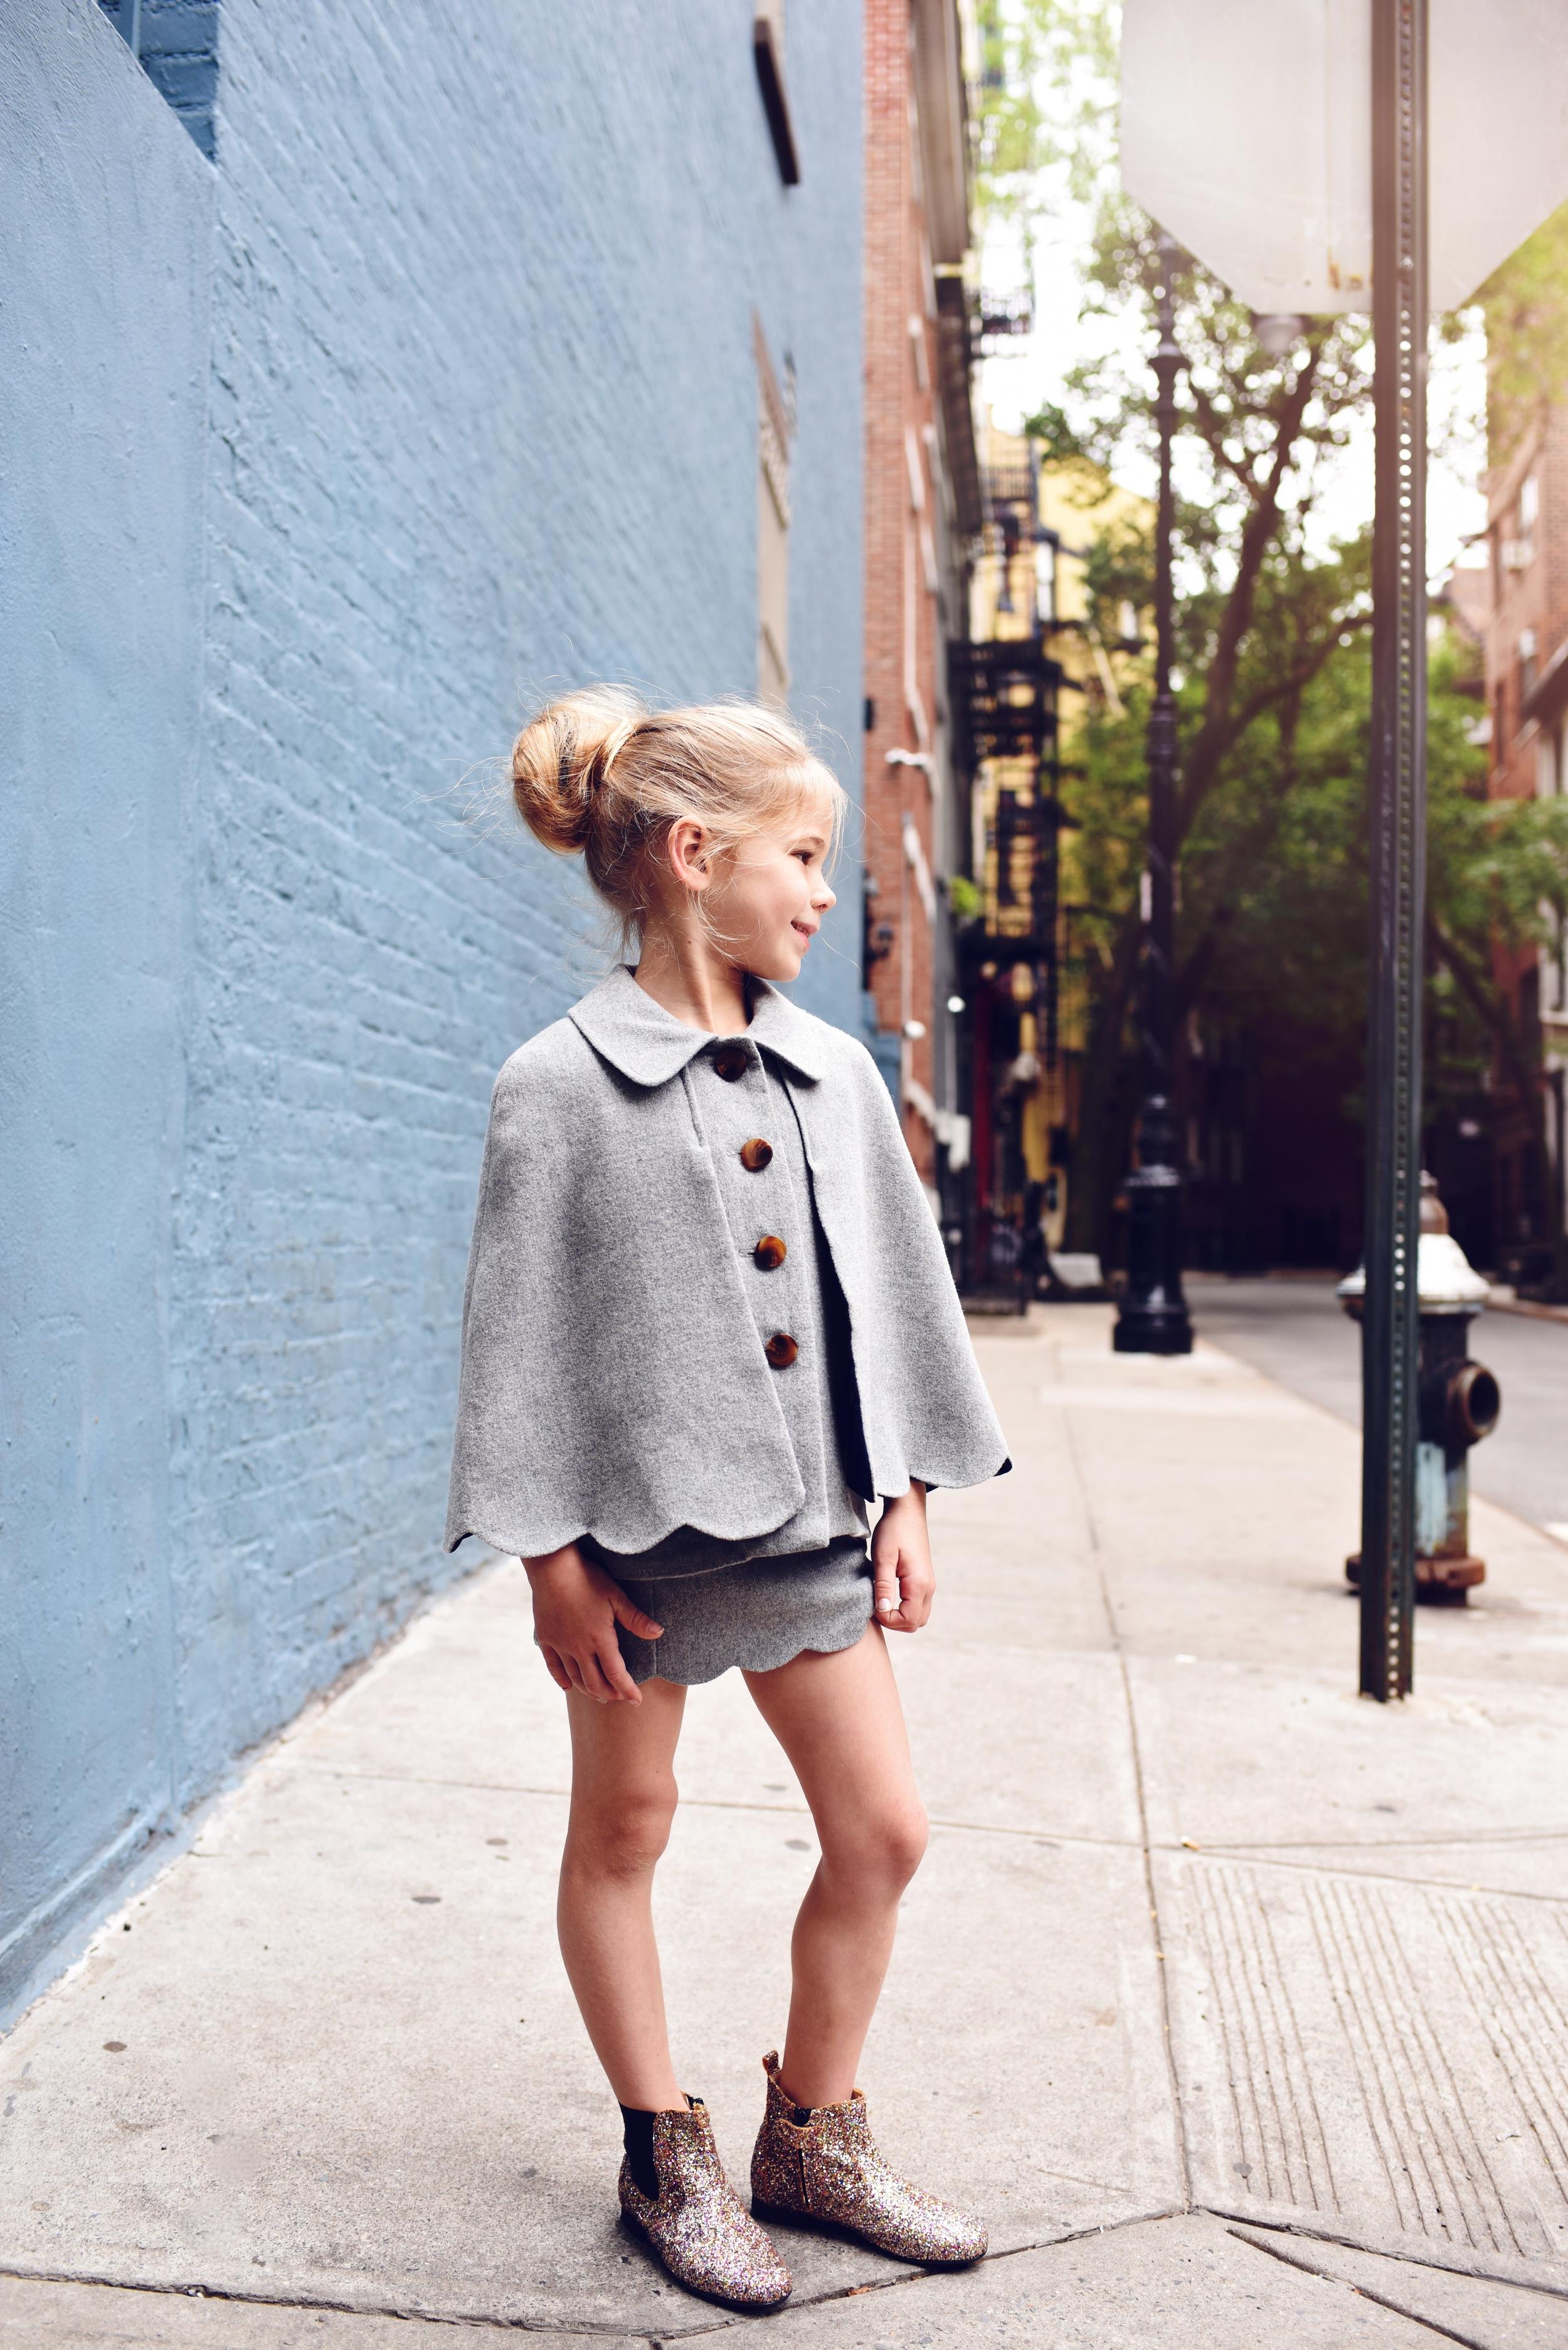 Enfant Street Style by Gina Kim Photography Hucklebones dress